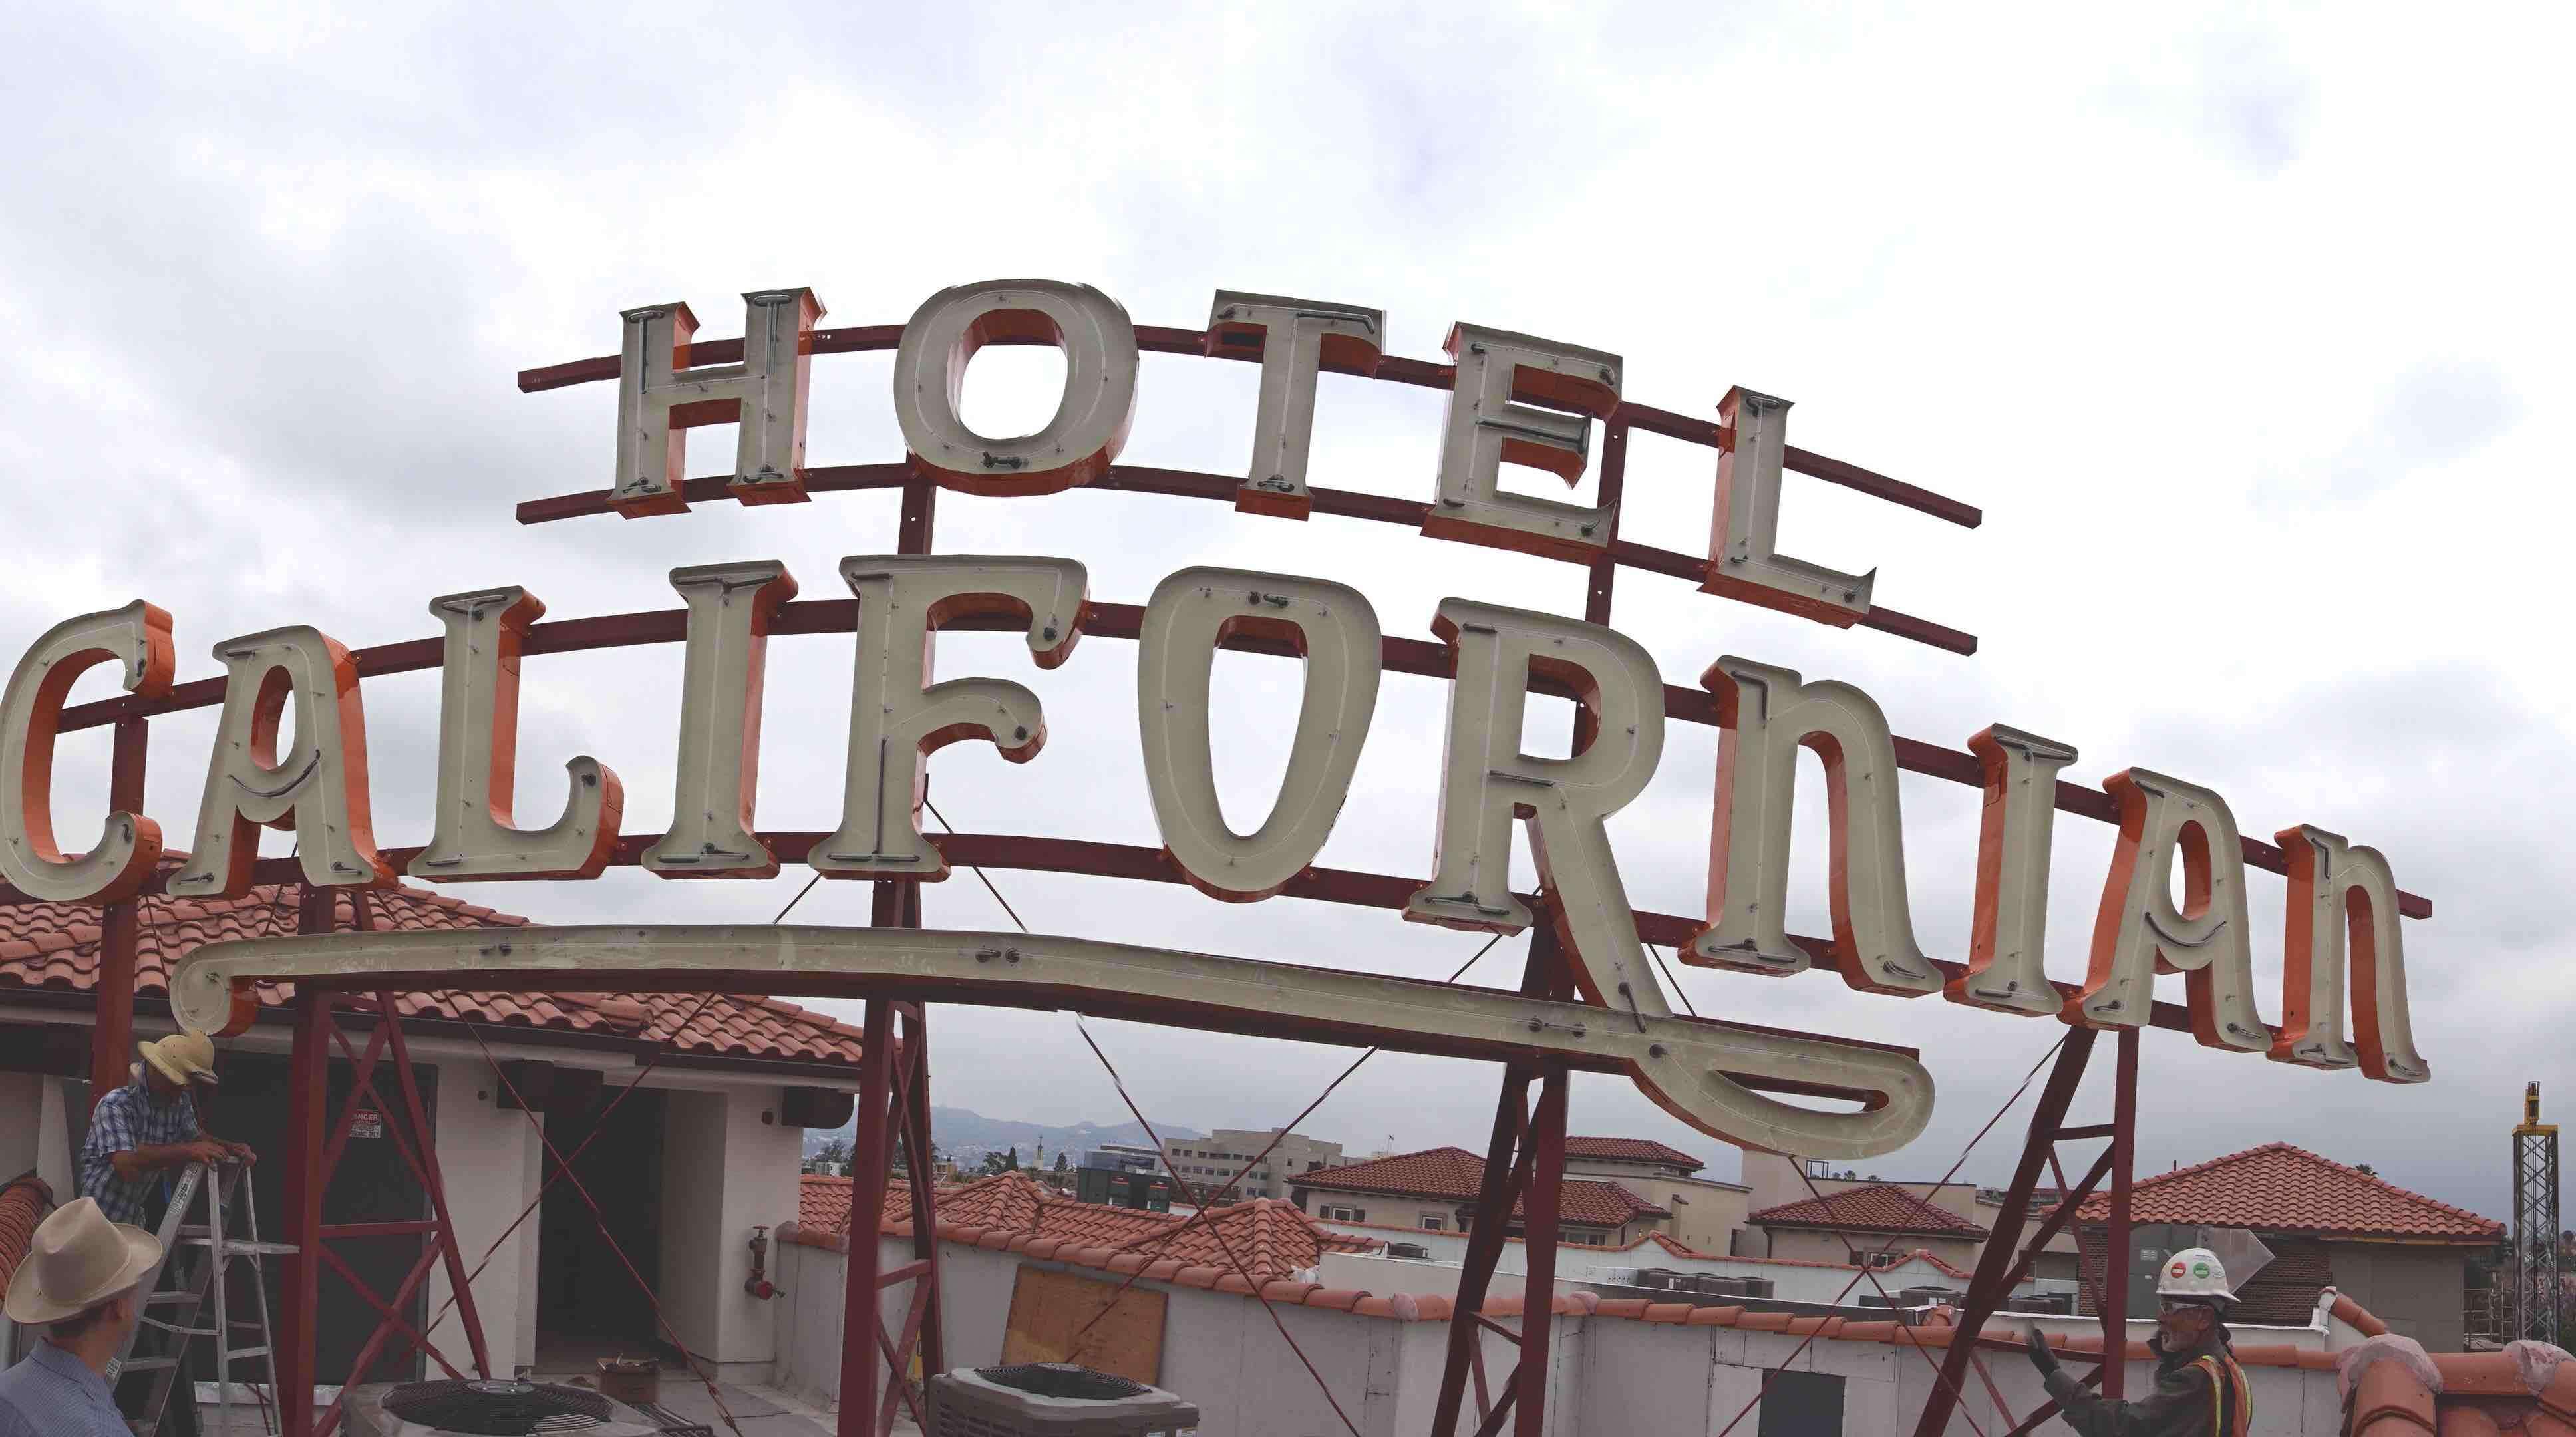 Historic Hotel Californian neon sign rededication